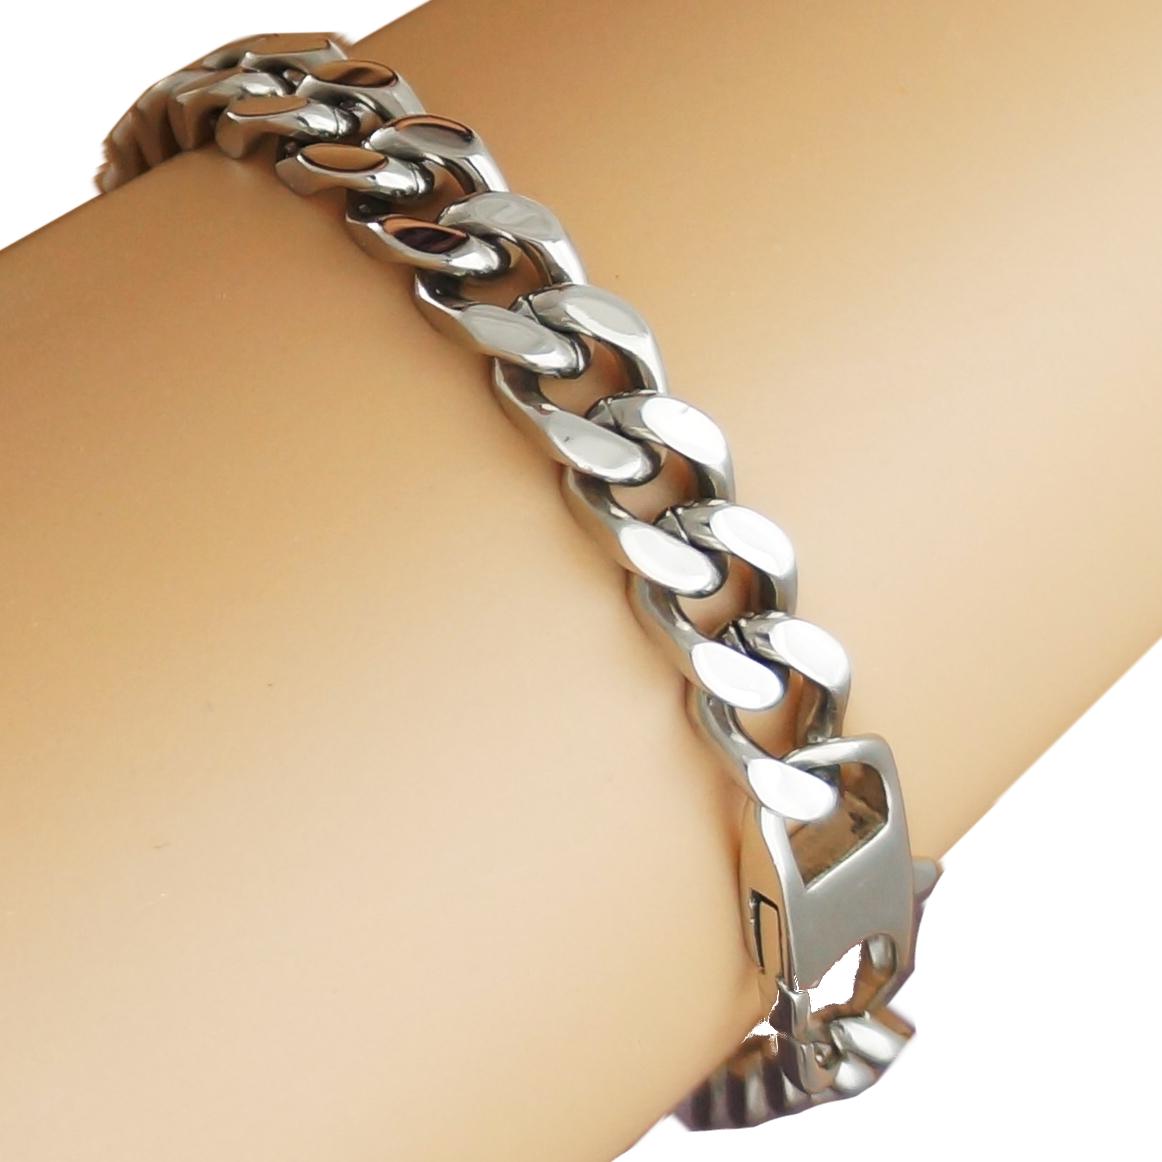 schmuck edelstahl panzerkette panzerarmband kette armband. Black Bedroom Furniture Sets. Home Design Ideas